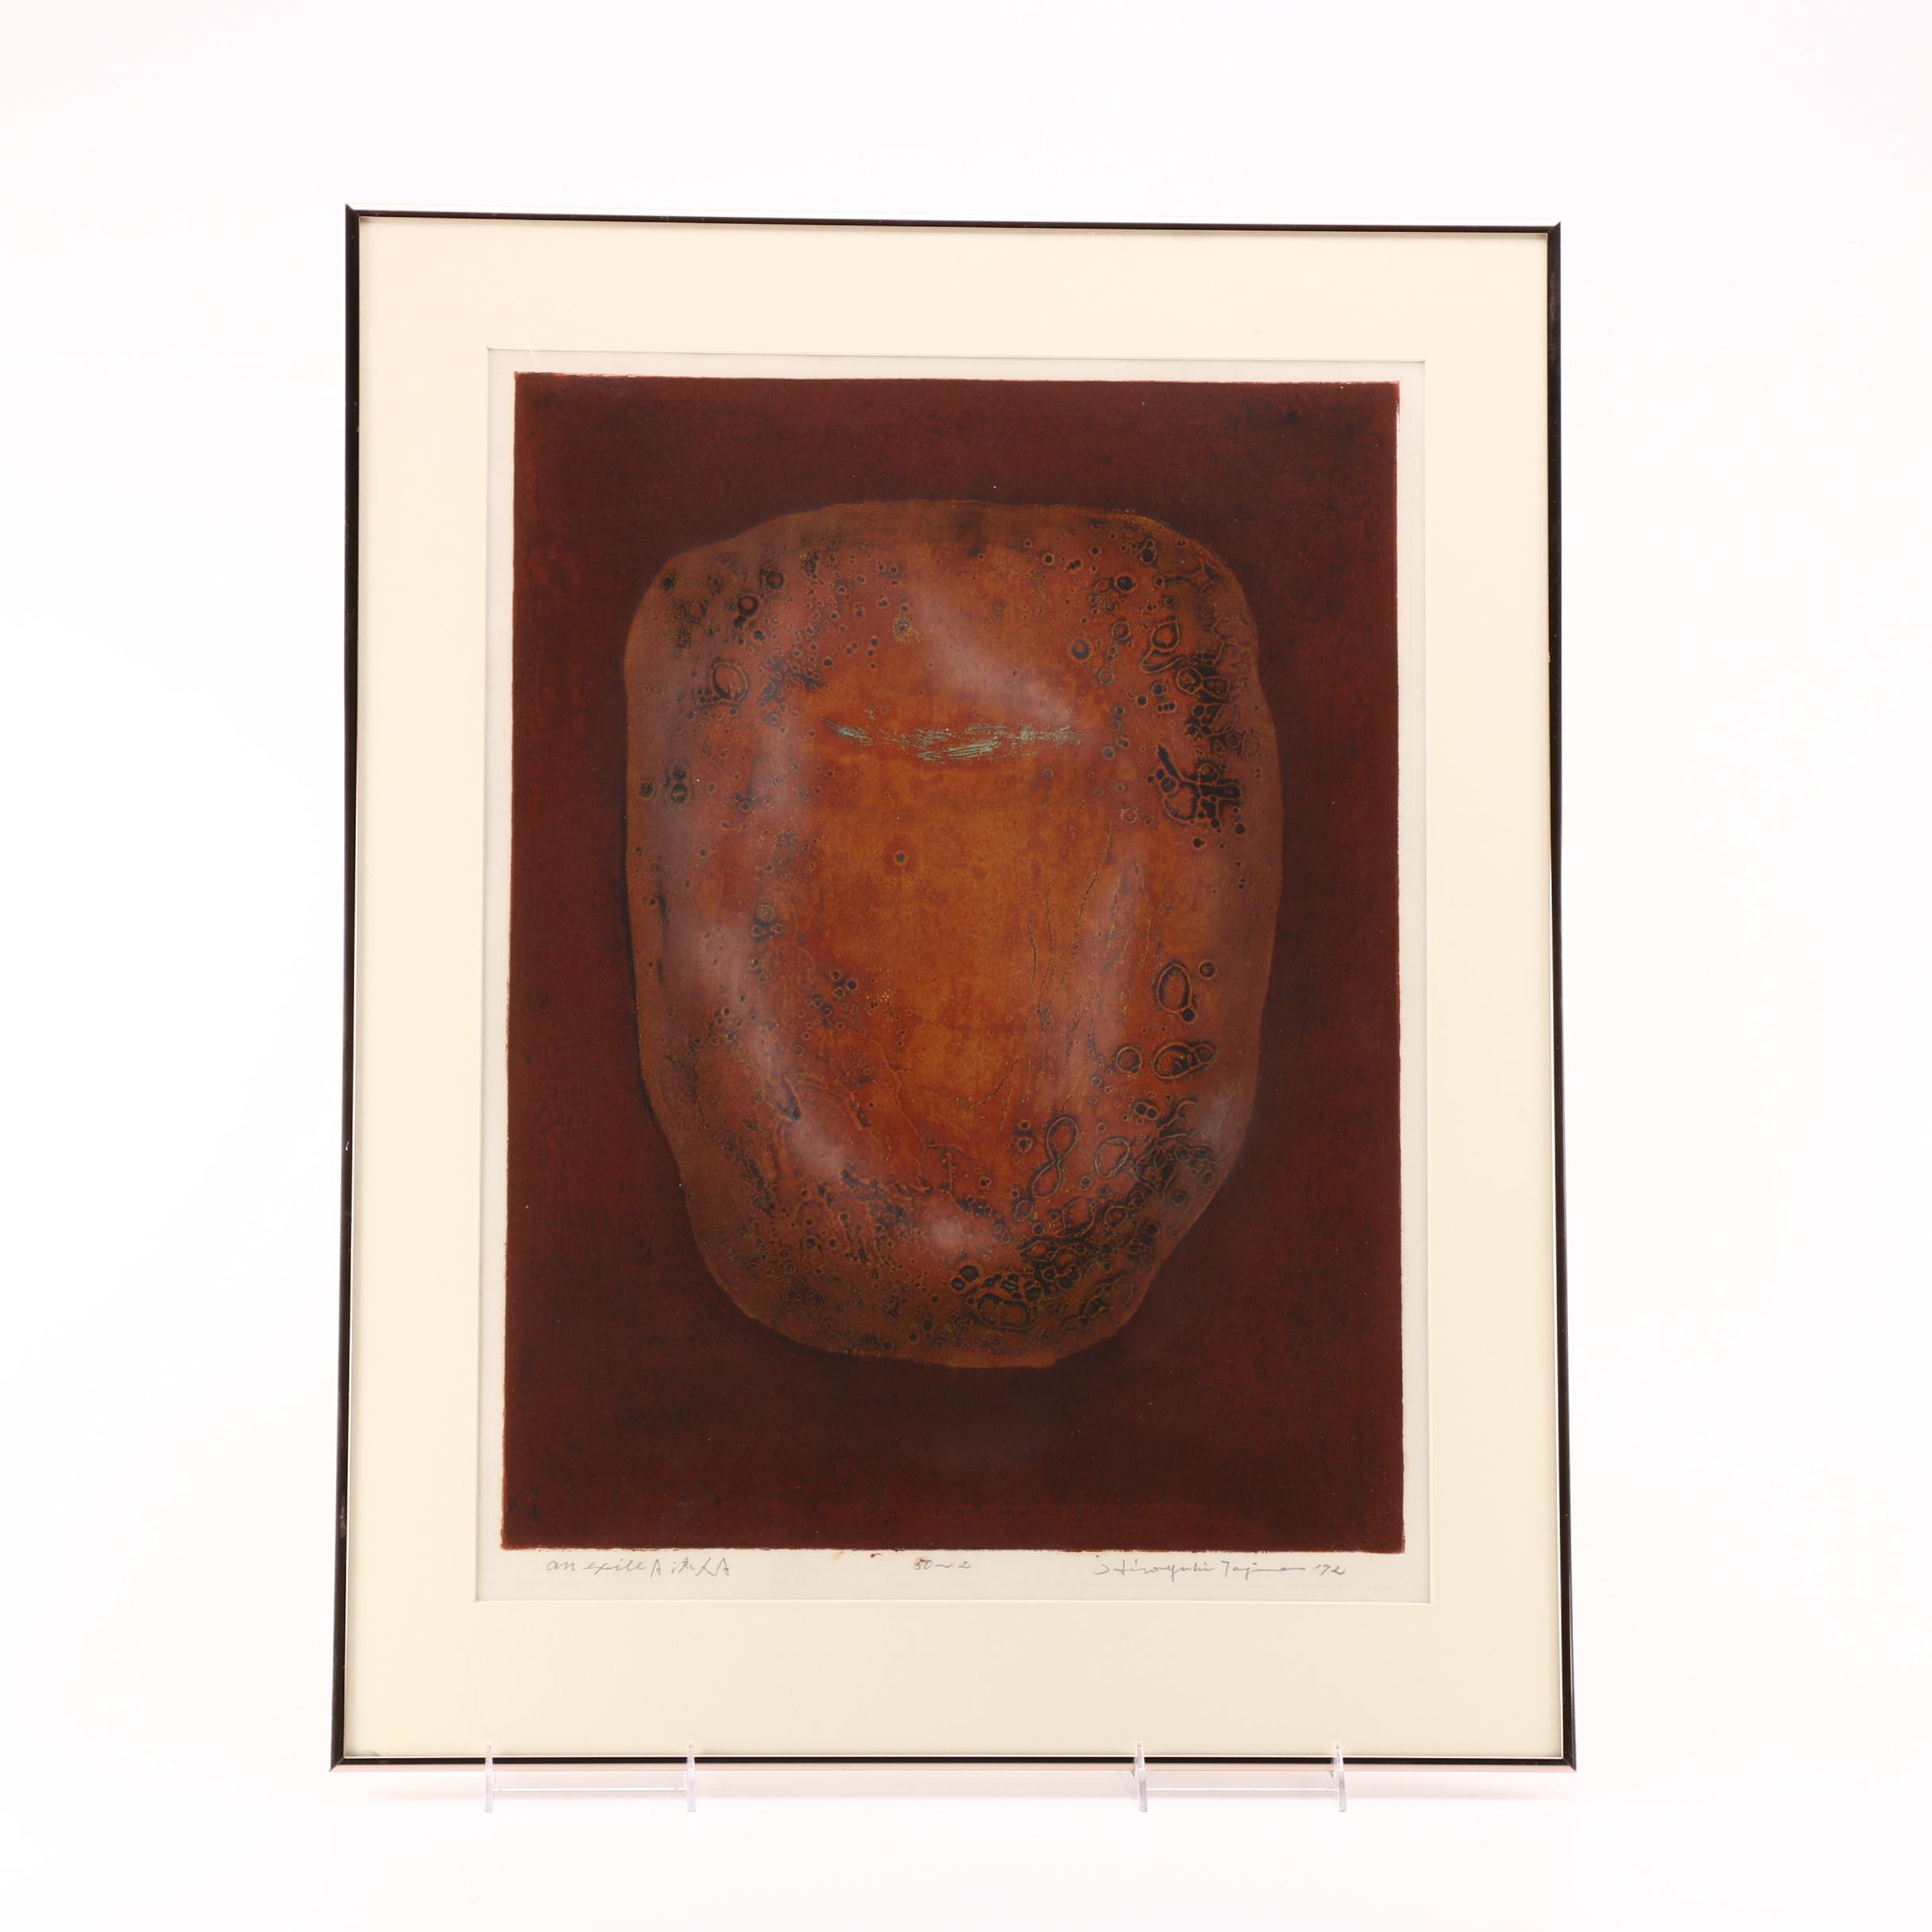 Hiroyuki Tajima Aquatint Etching on Paper of an Artifact